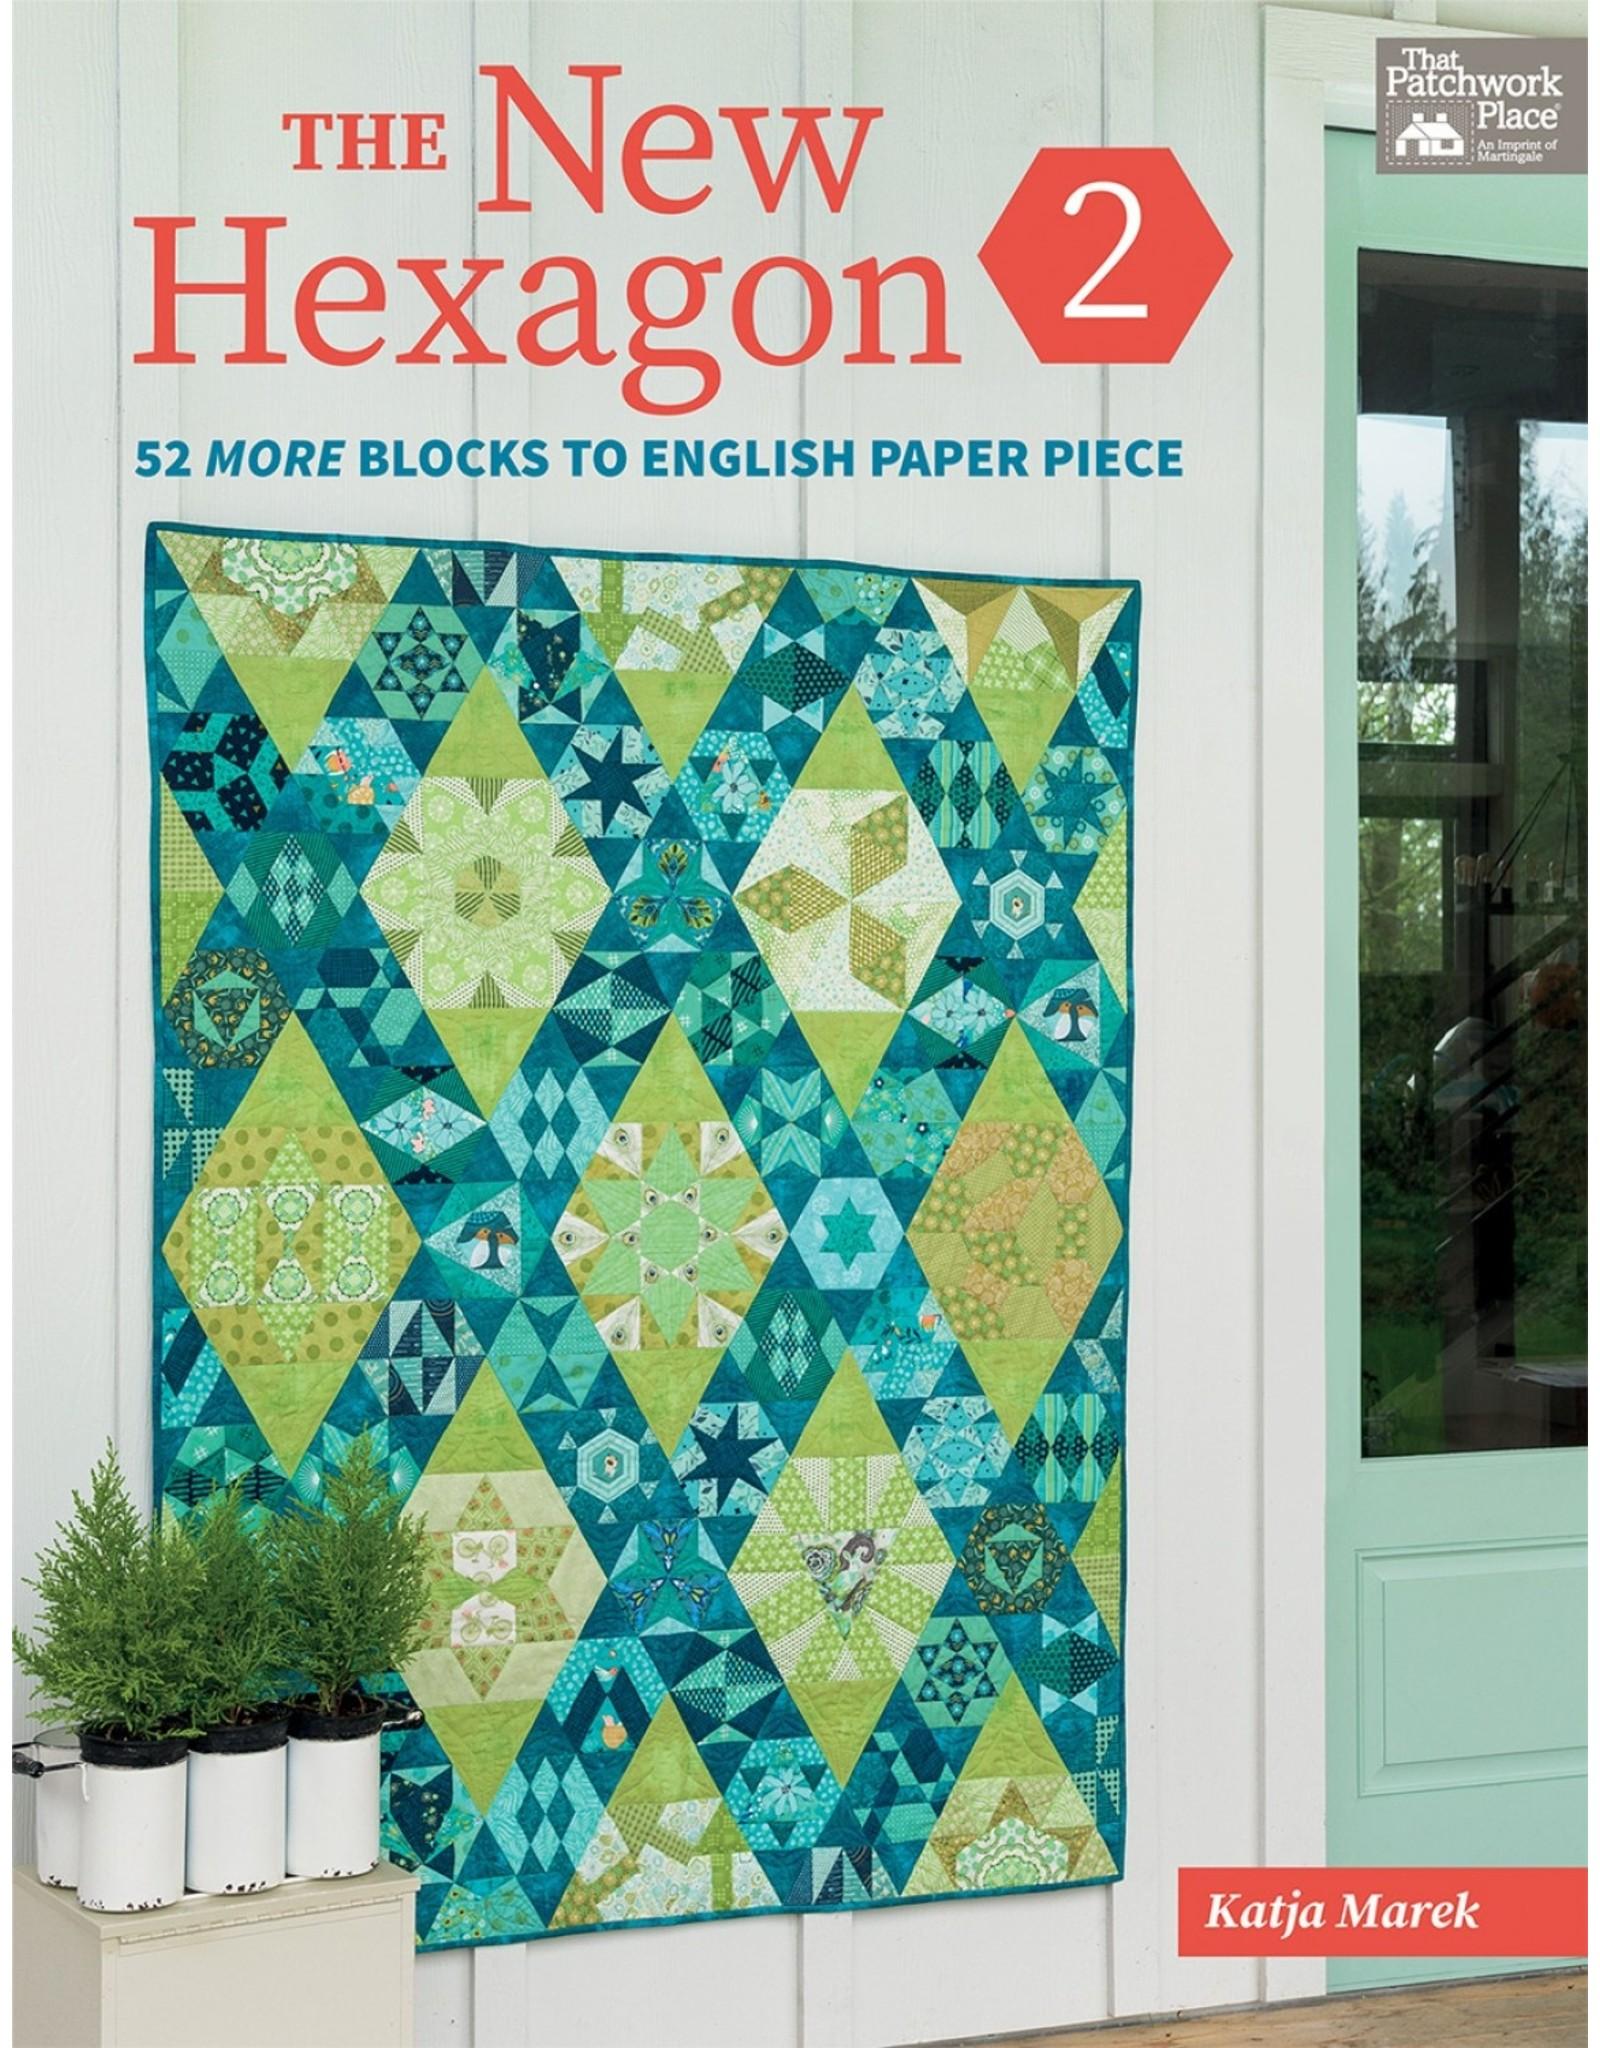 That Patchwork Place The New Hexagon 2 - Katja Marek